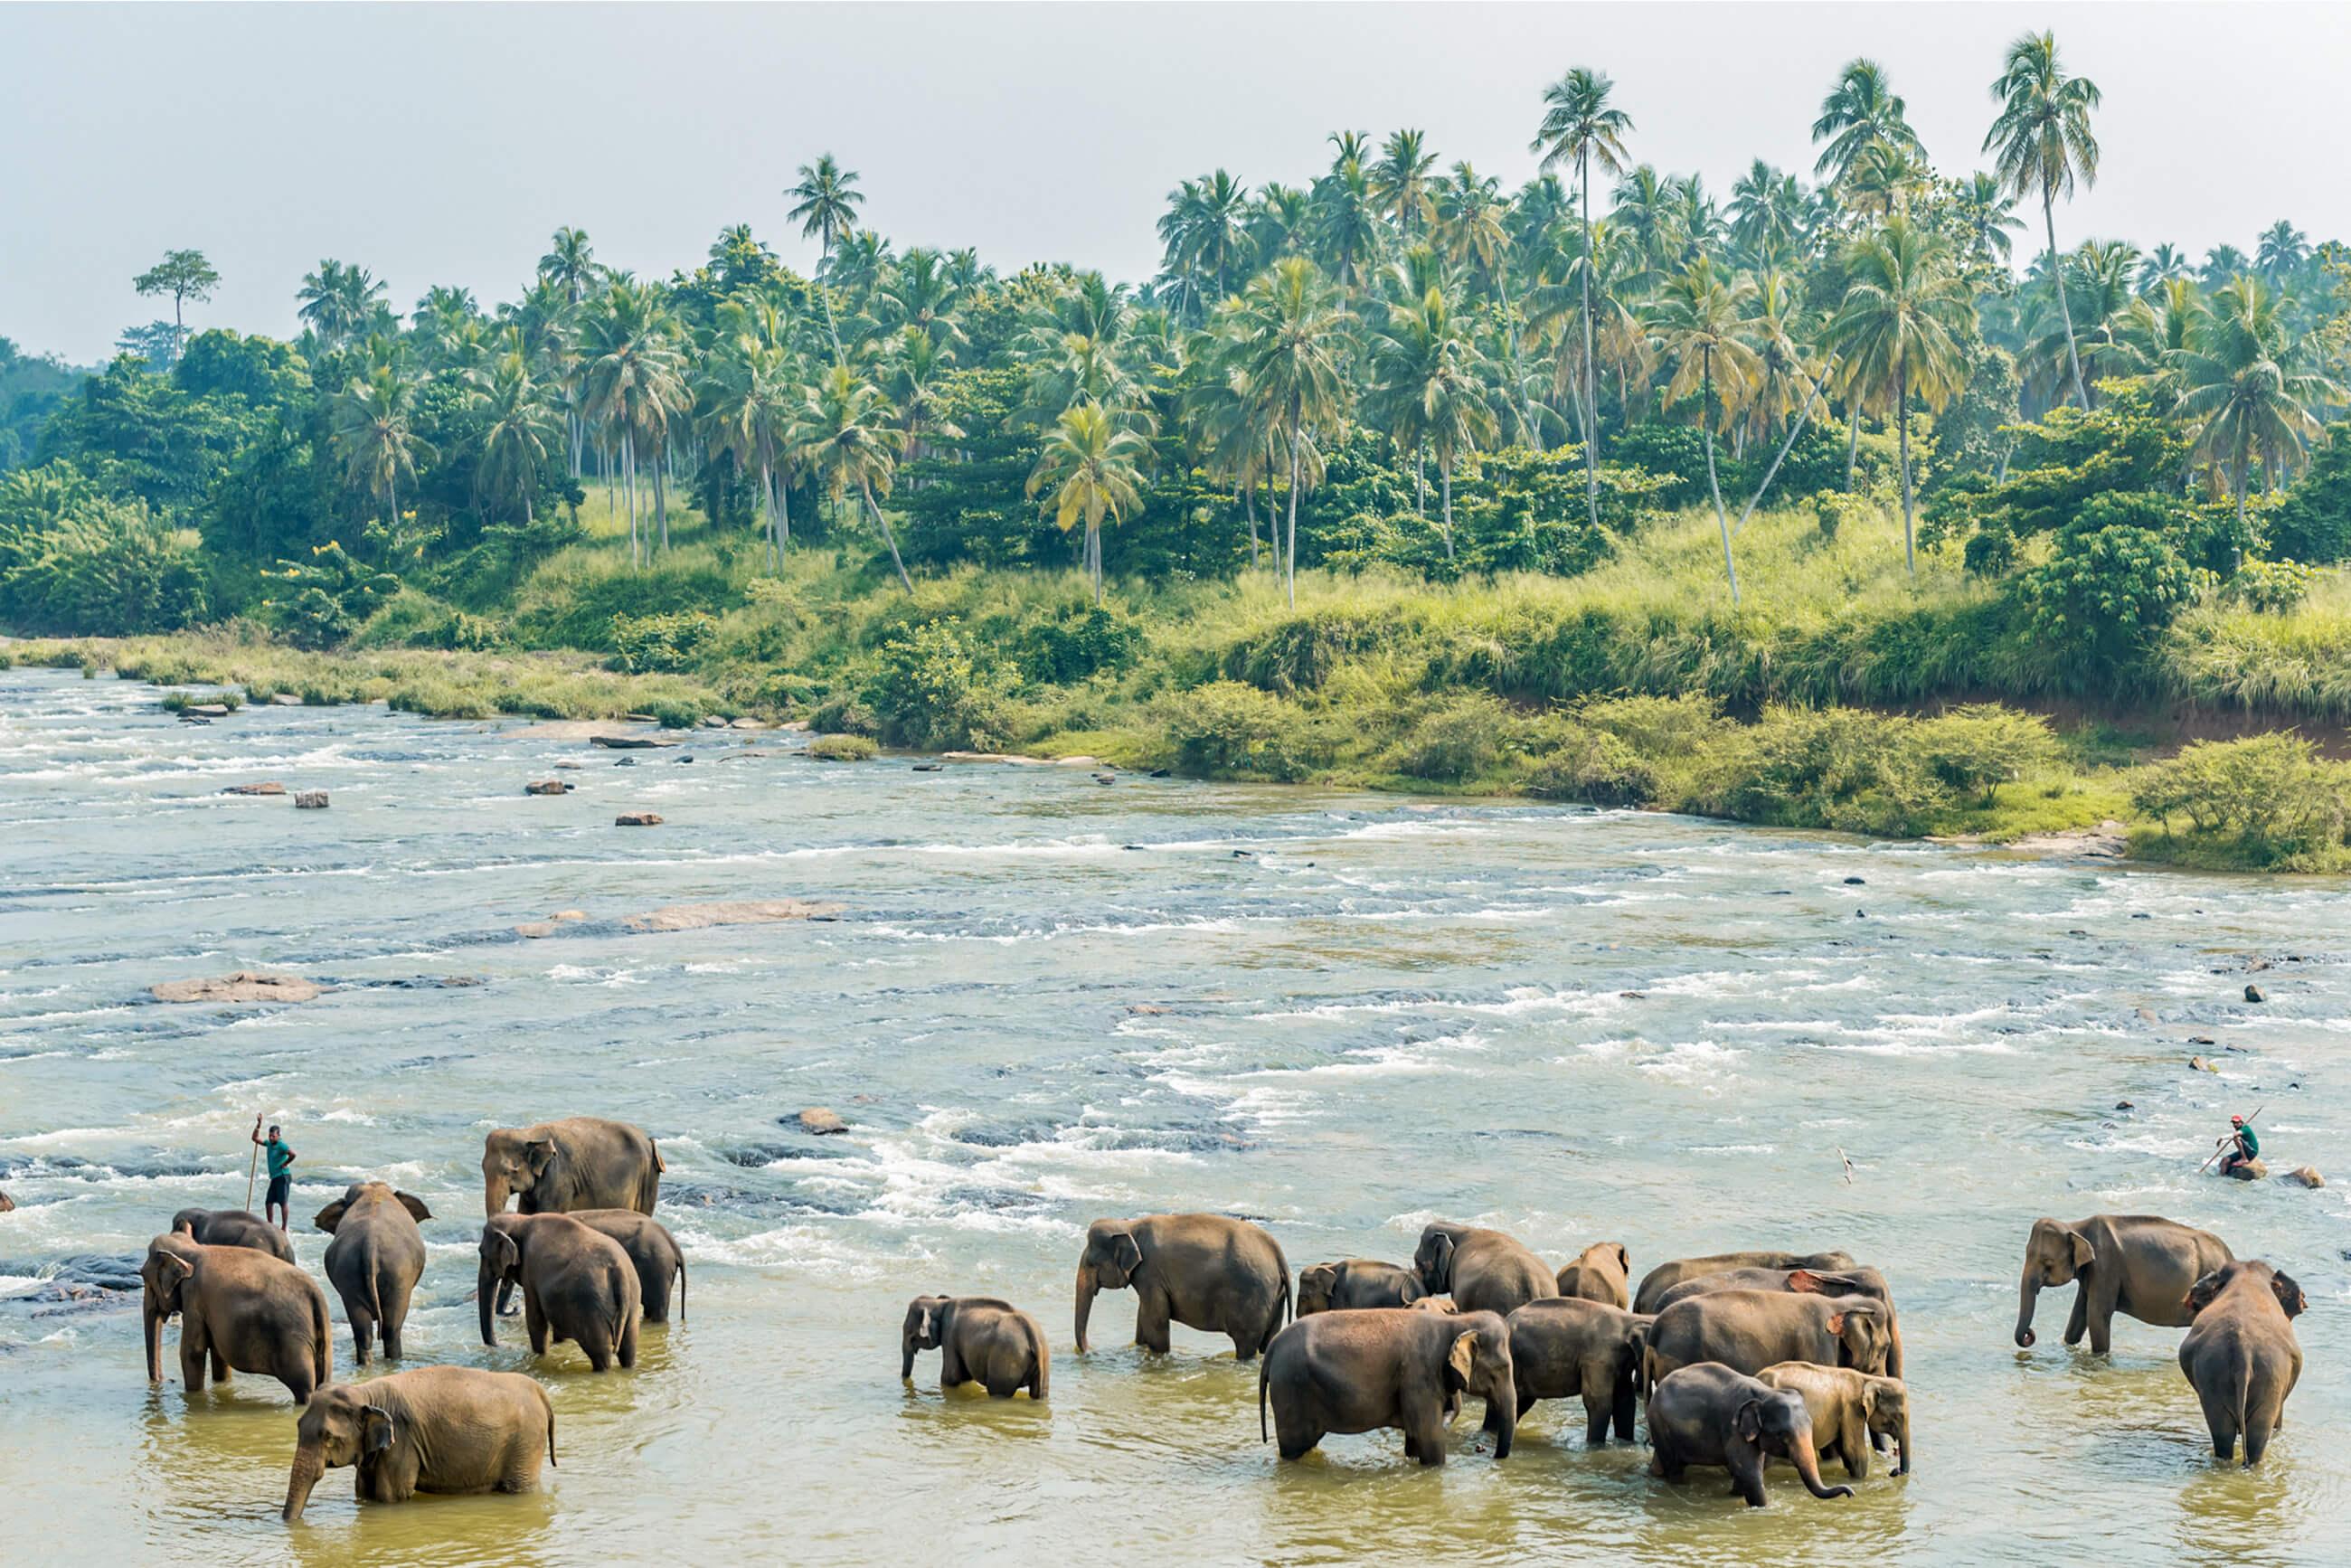 https://bubo.sk/uploads/galleries/7327/martinferencik_srilanka_dsc8951-1-.jpg